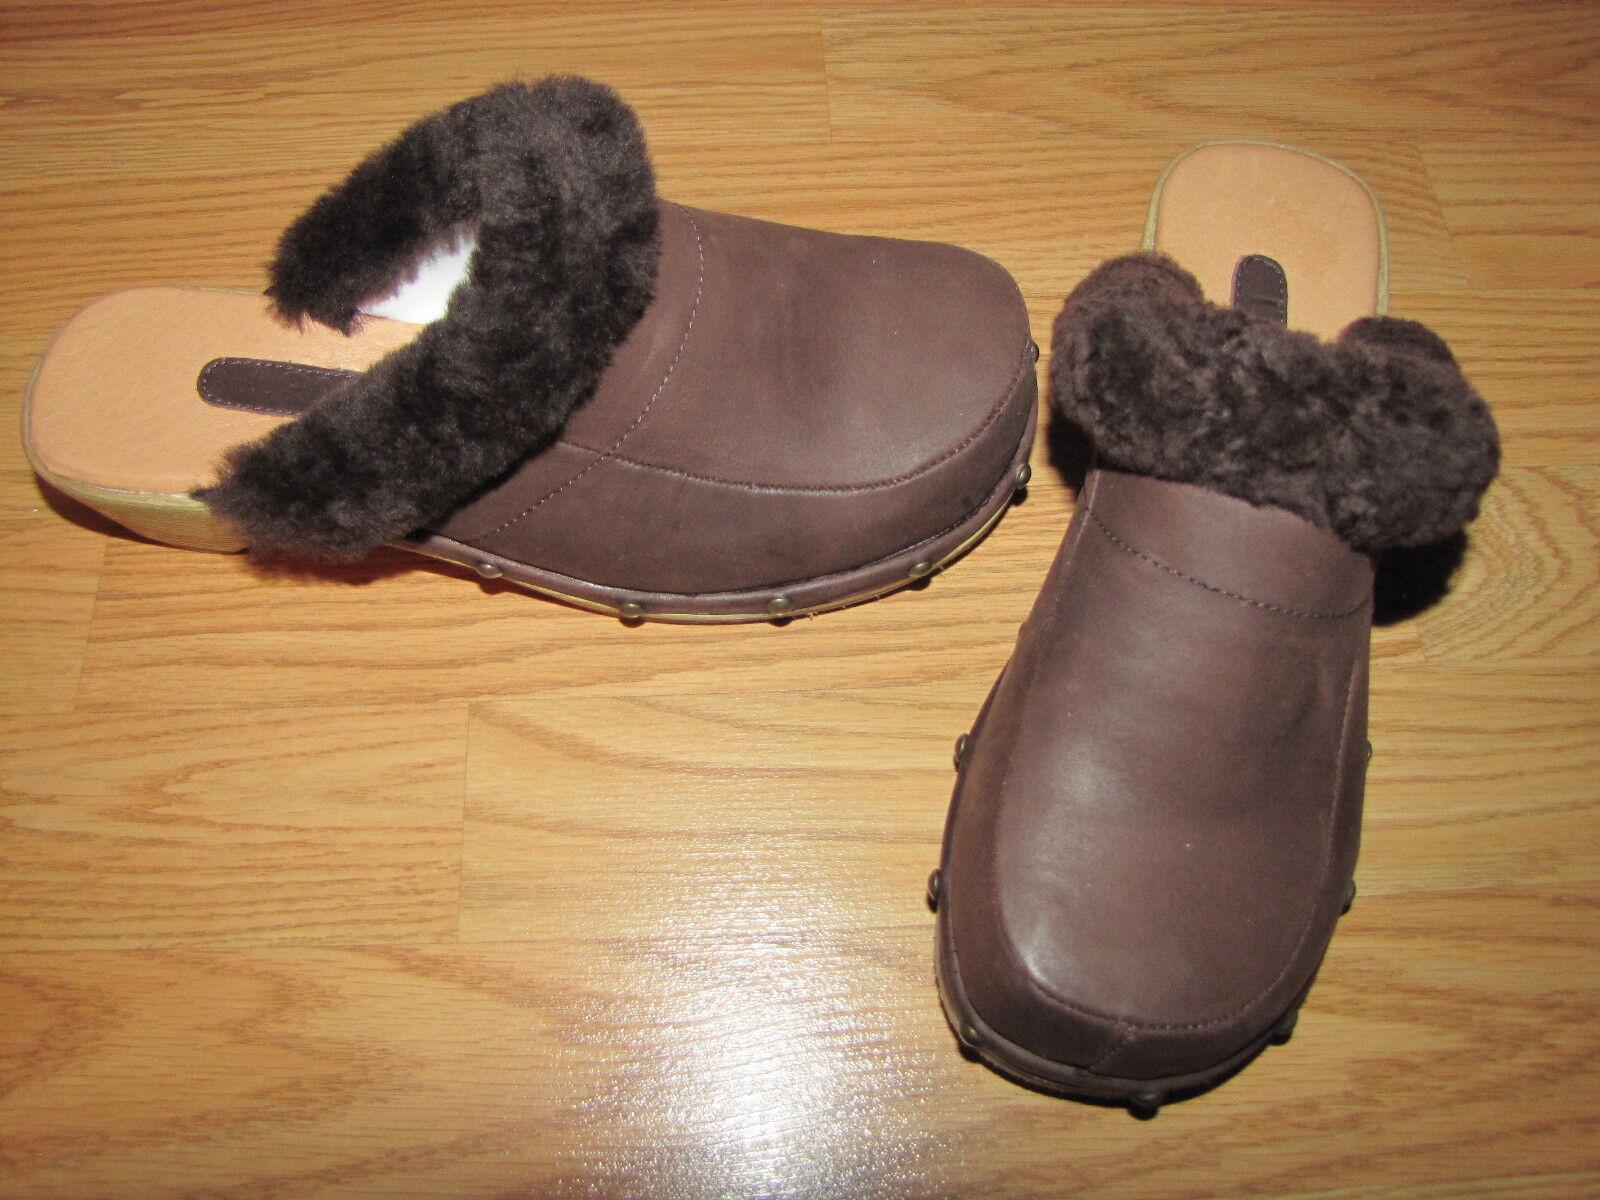 NWOB Lamo 'Monica' Brown Sheepskin Clogs - 8 European 38.5